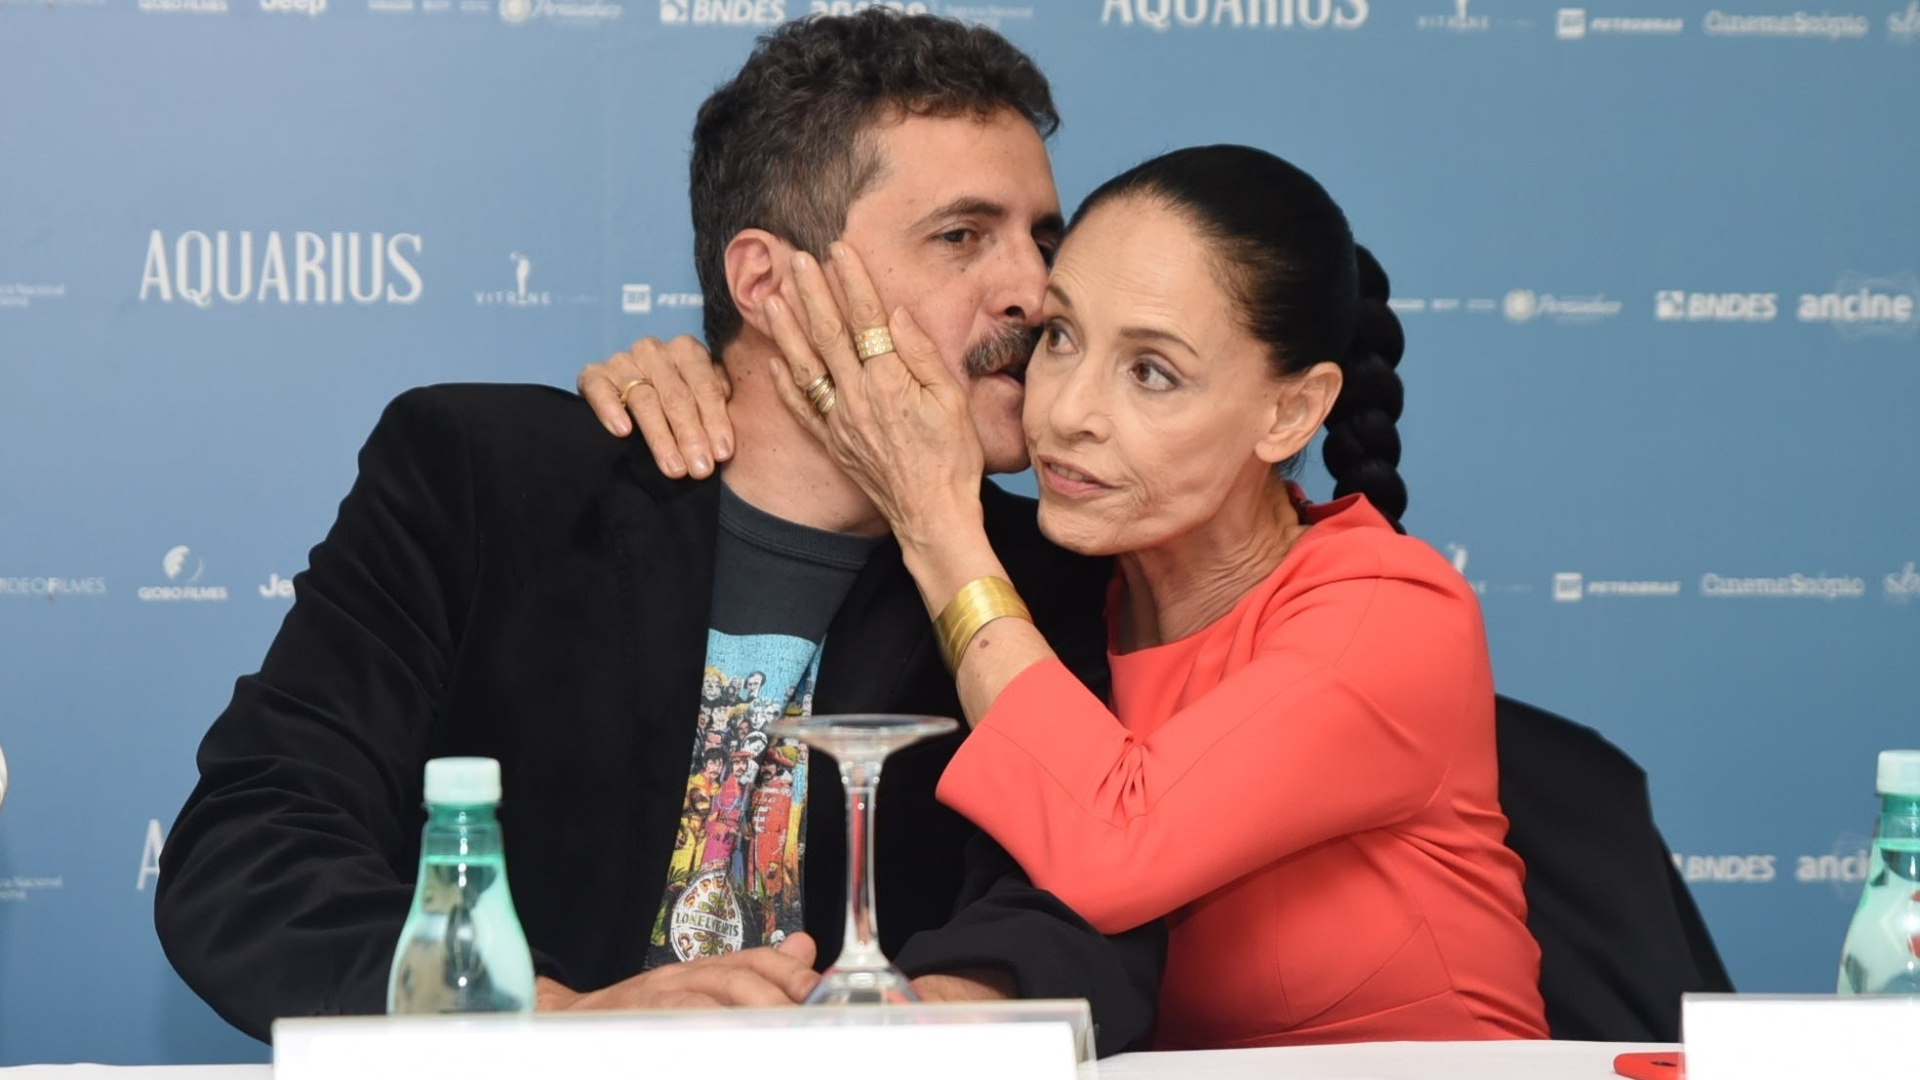 29.ago.2016 - O cineasta Kleber Mendonça Filho beija Sonia Braga durante coletiva do filme